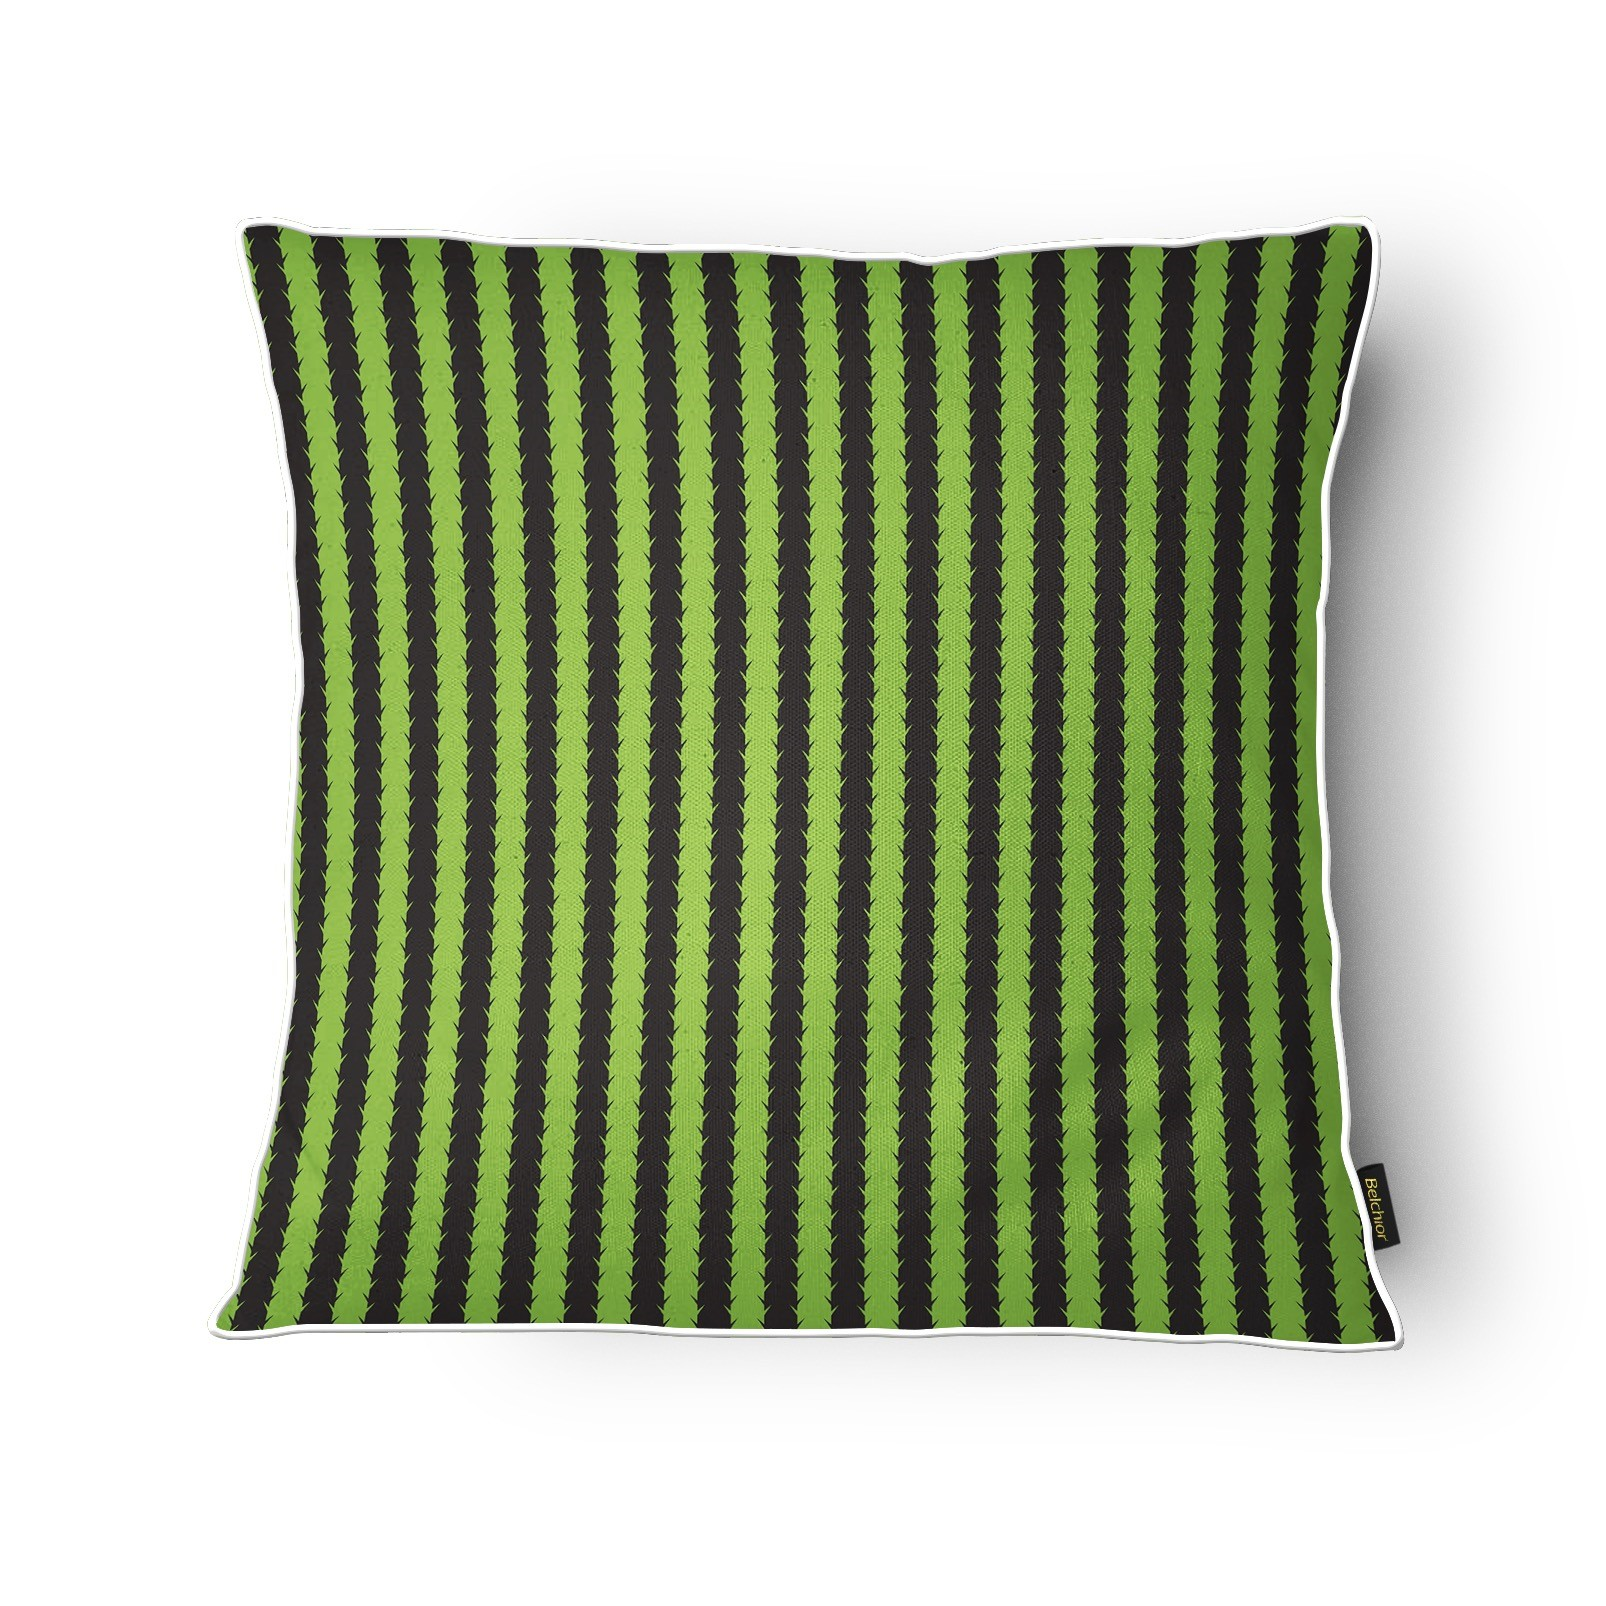 Almofada Colors Estampada 43x43 cm Verde 467059 - Belchior